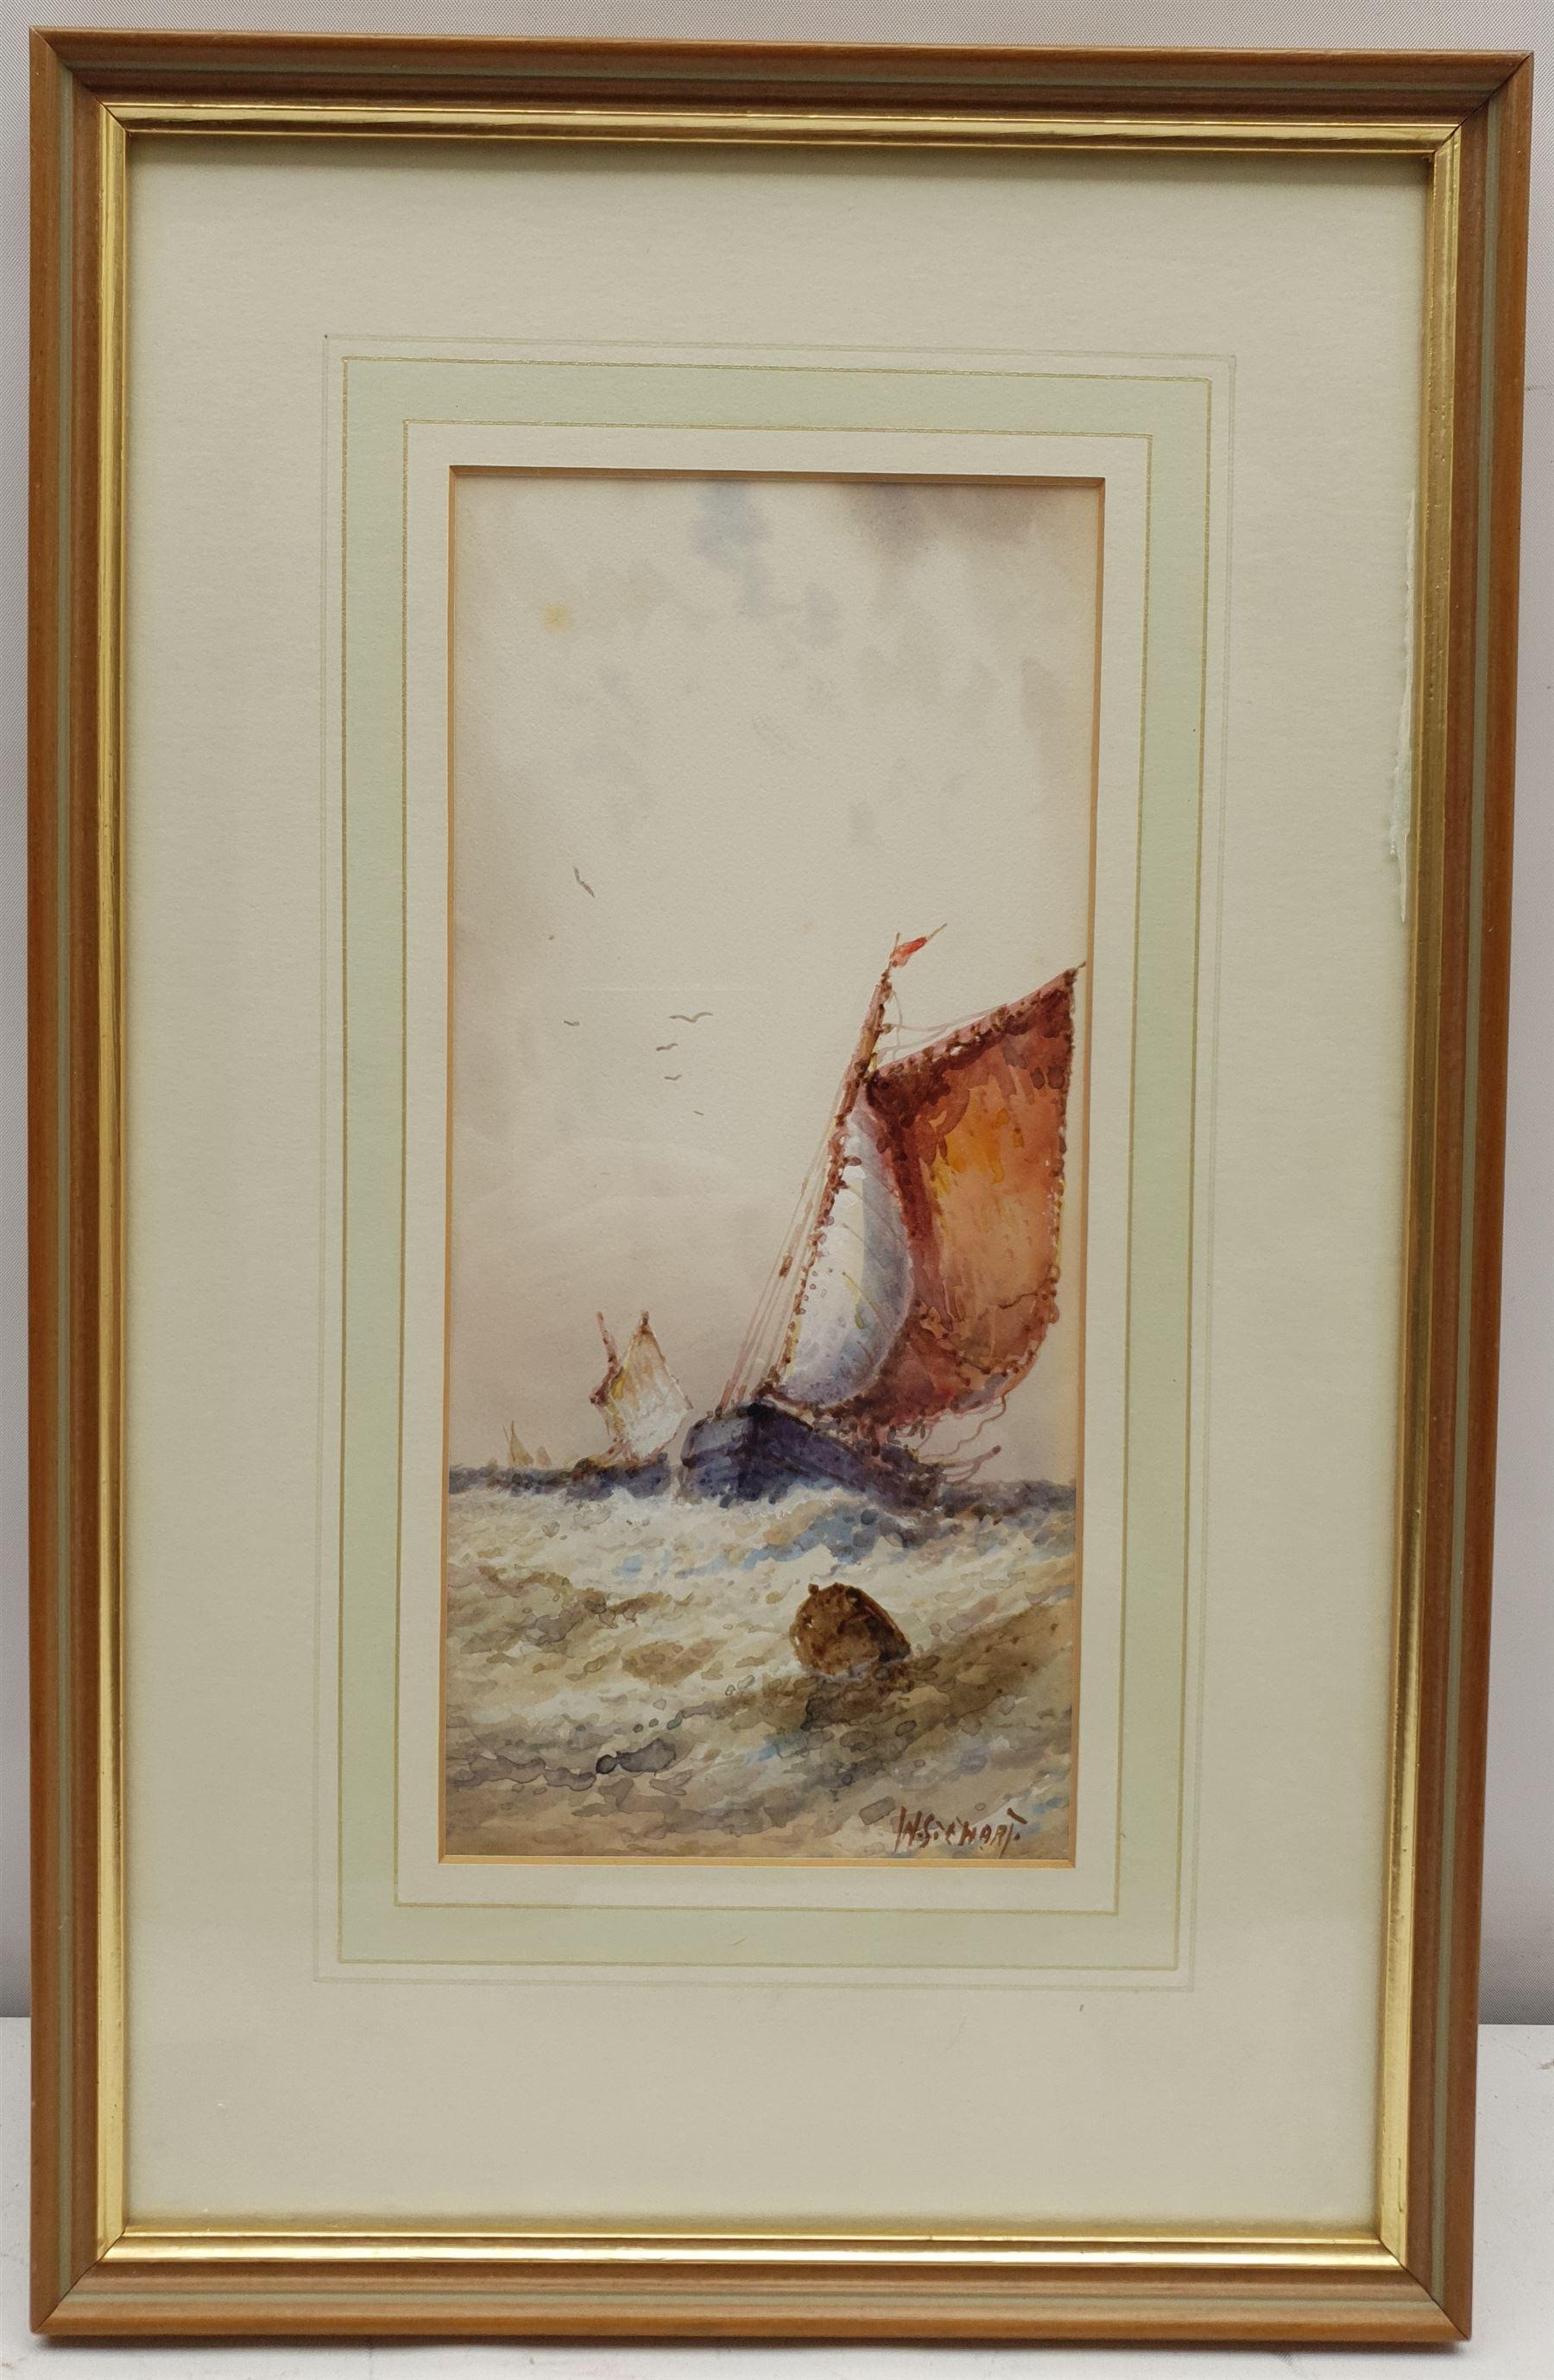 William Stewart (British 1823-1906): Ship at Sea - Image 2 of 2